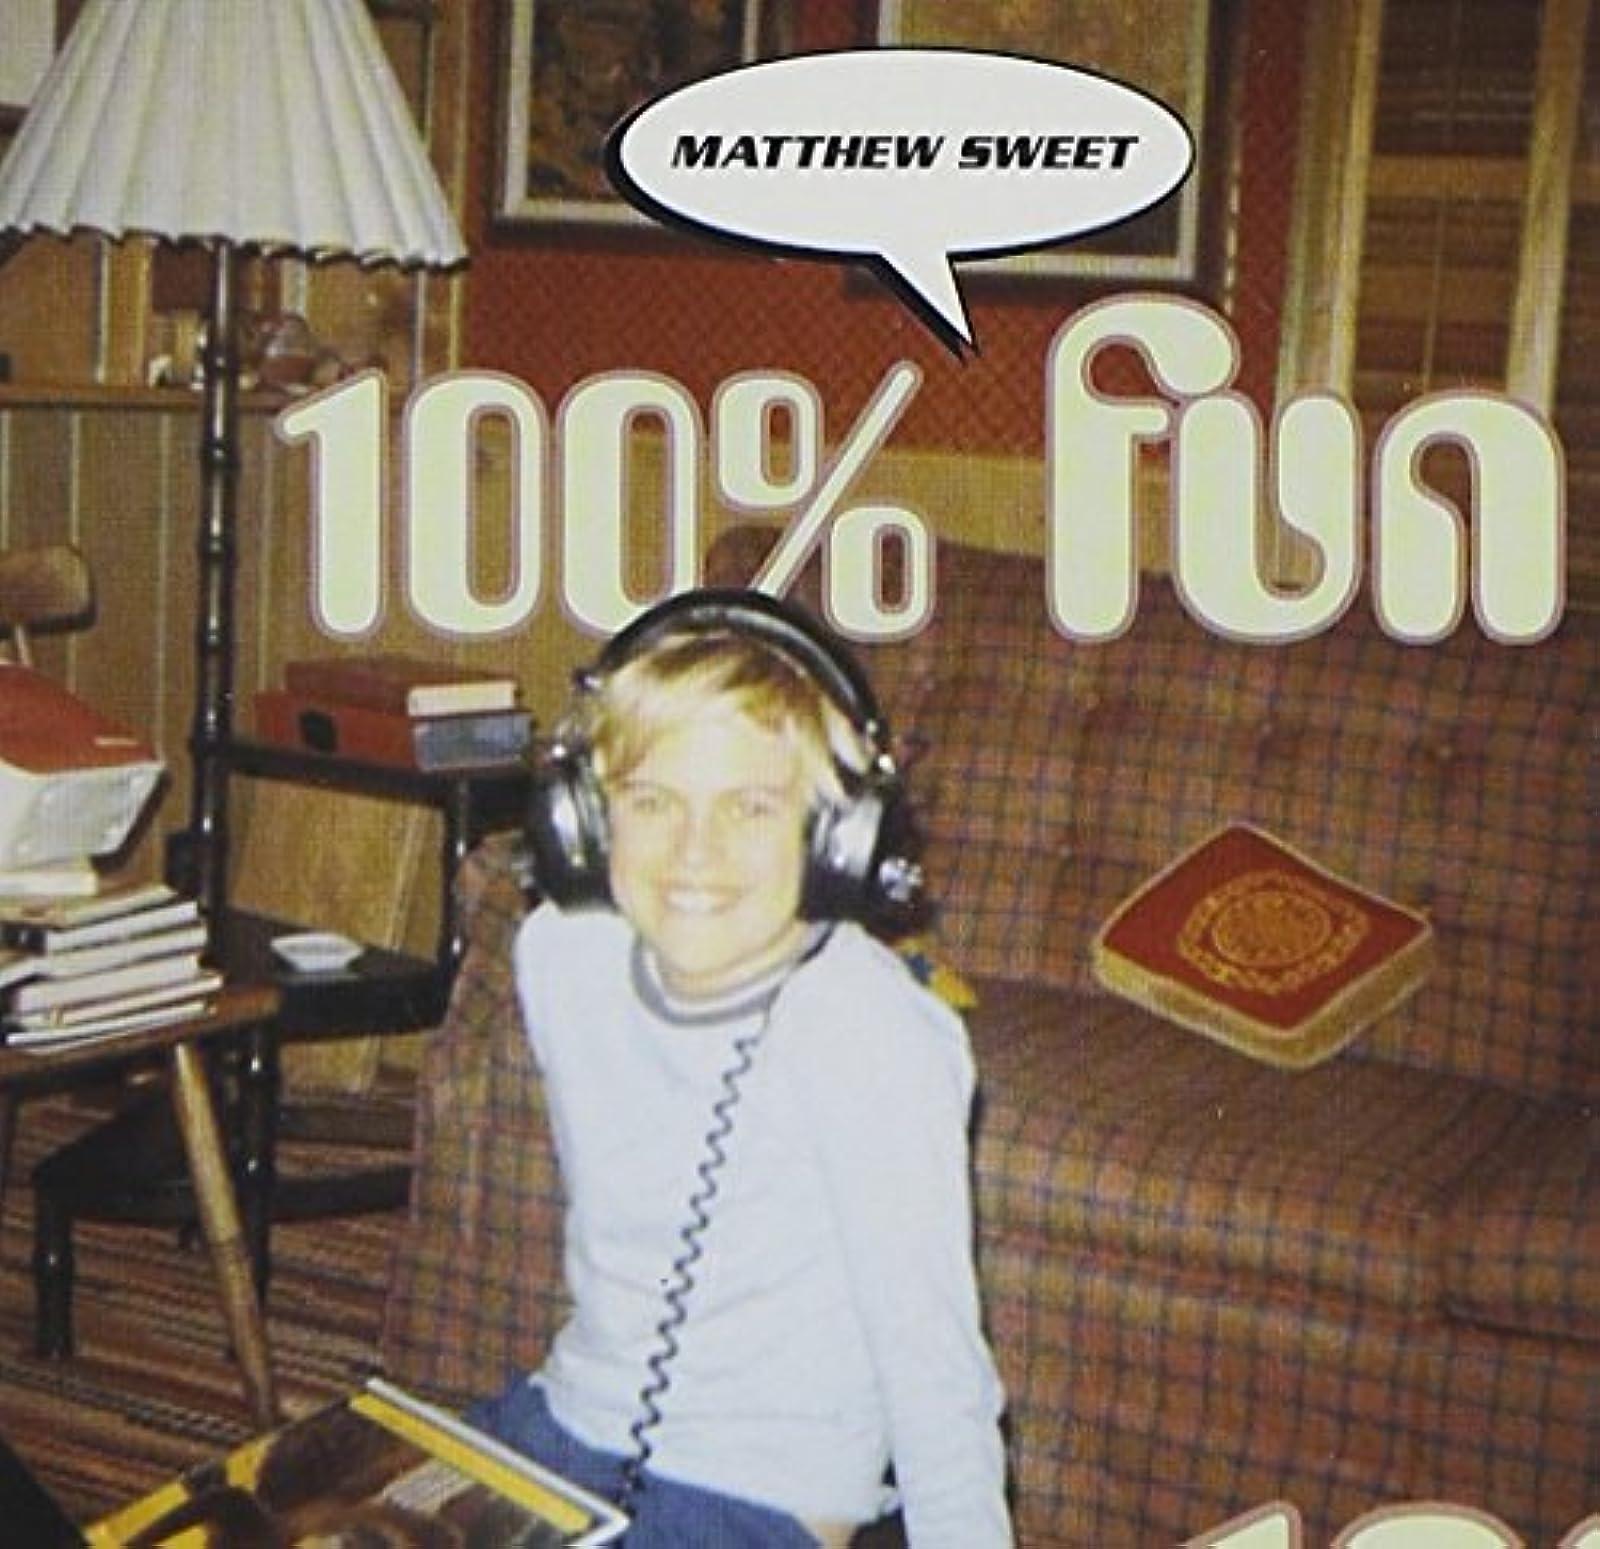 100% Fun By Matthew Sweet On Audio CD Album 2013